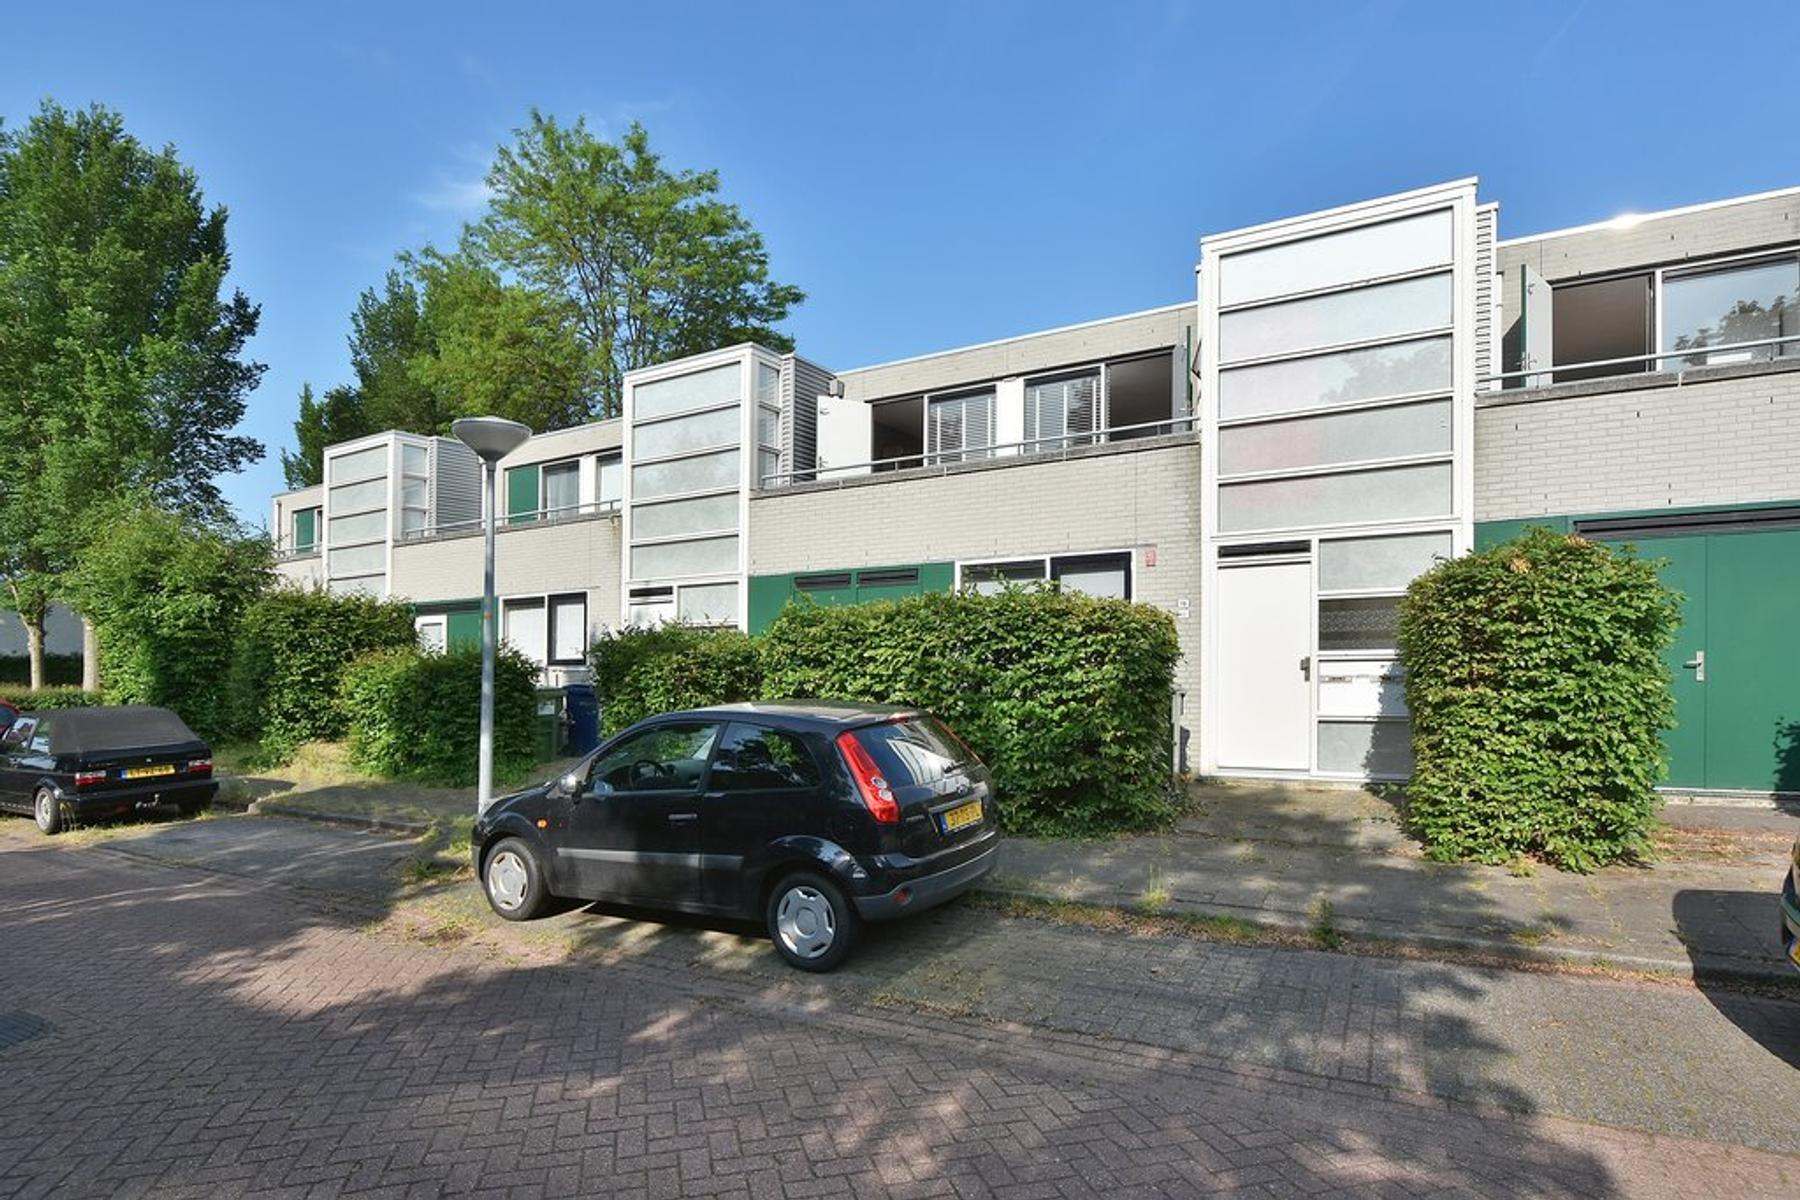 Laurence Olivierstraat 18 in Almere 1325 KC